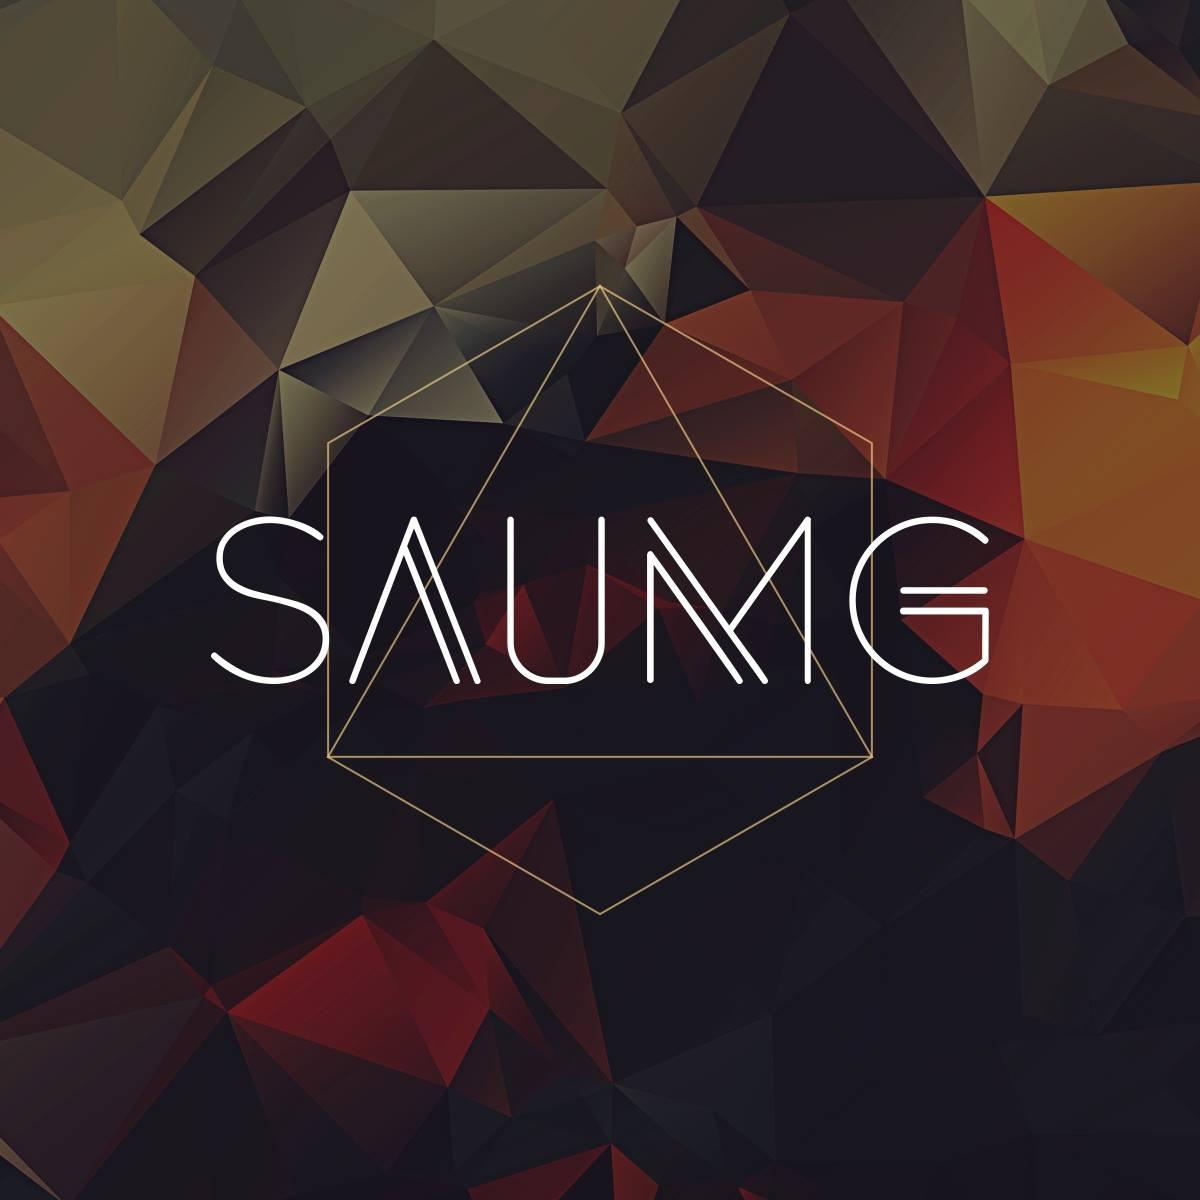 SaumG - Mind Goes Numb